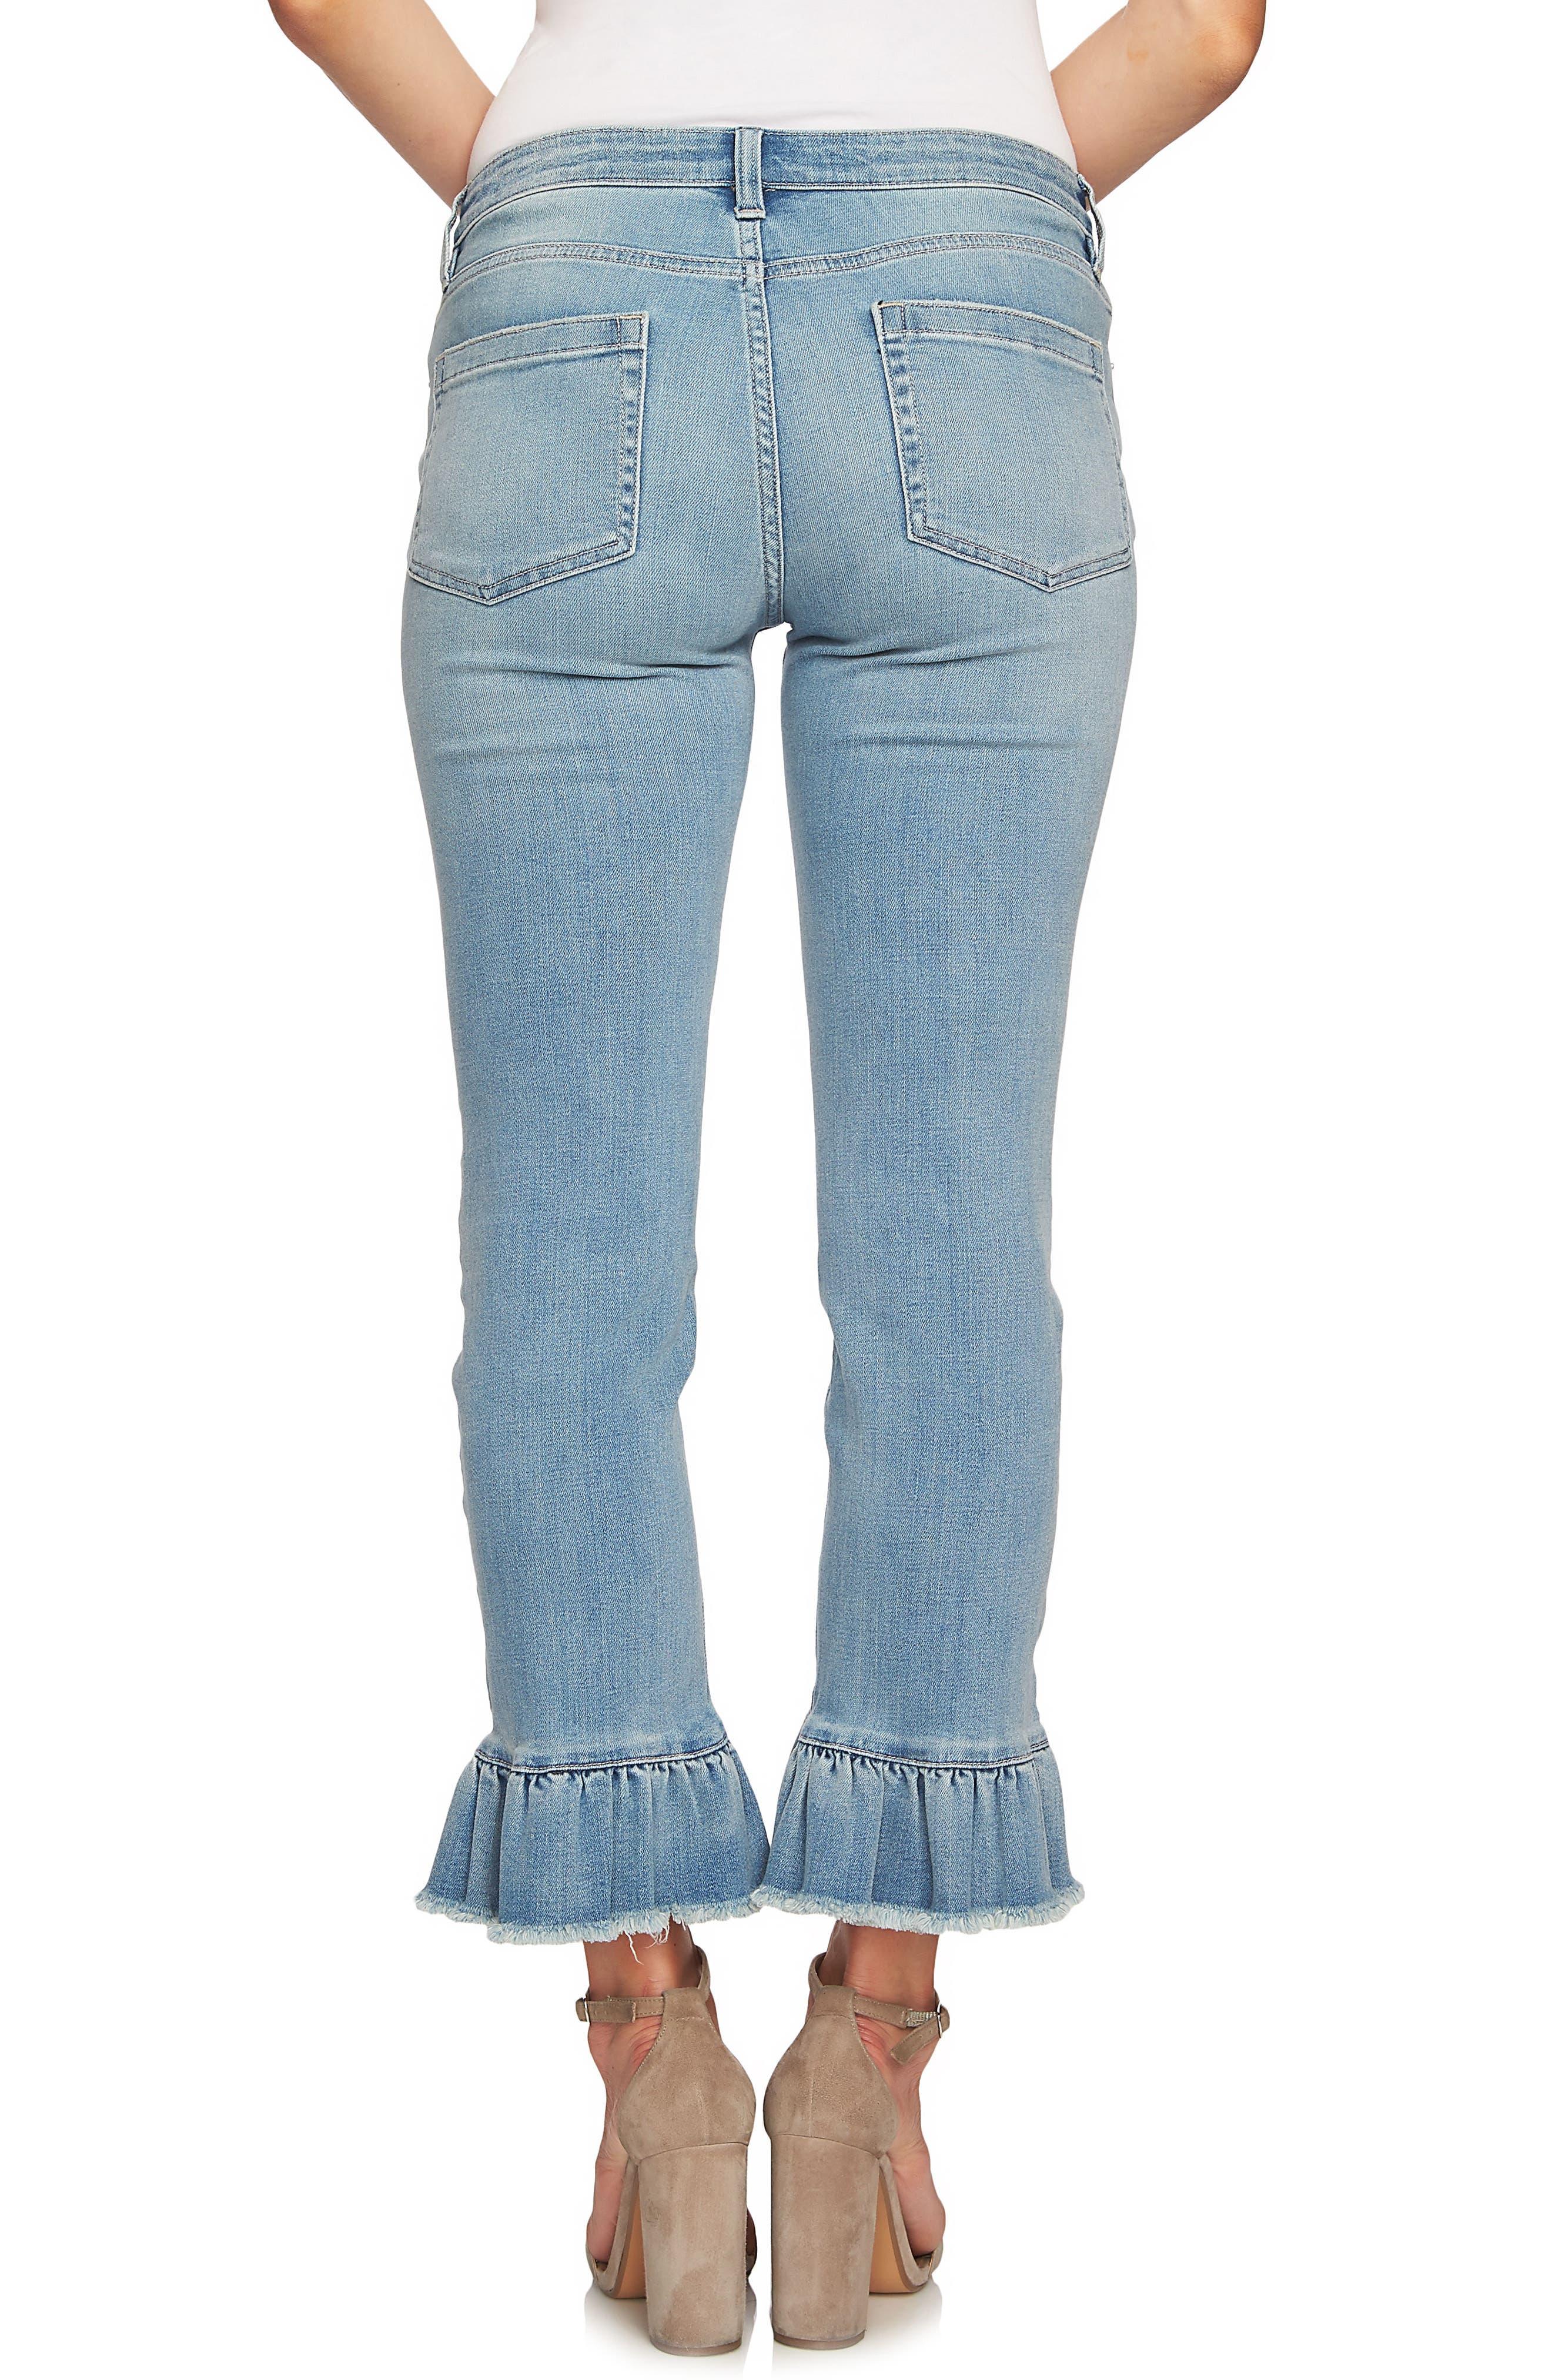 Ruffle Hem Ankle Jeans,                             Alternate thumbnail 2, color,                             Sun Washed Blue